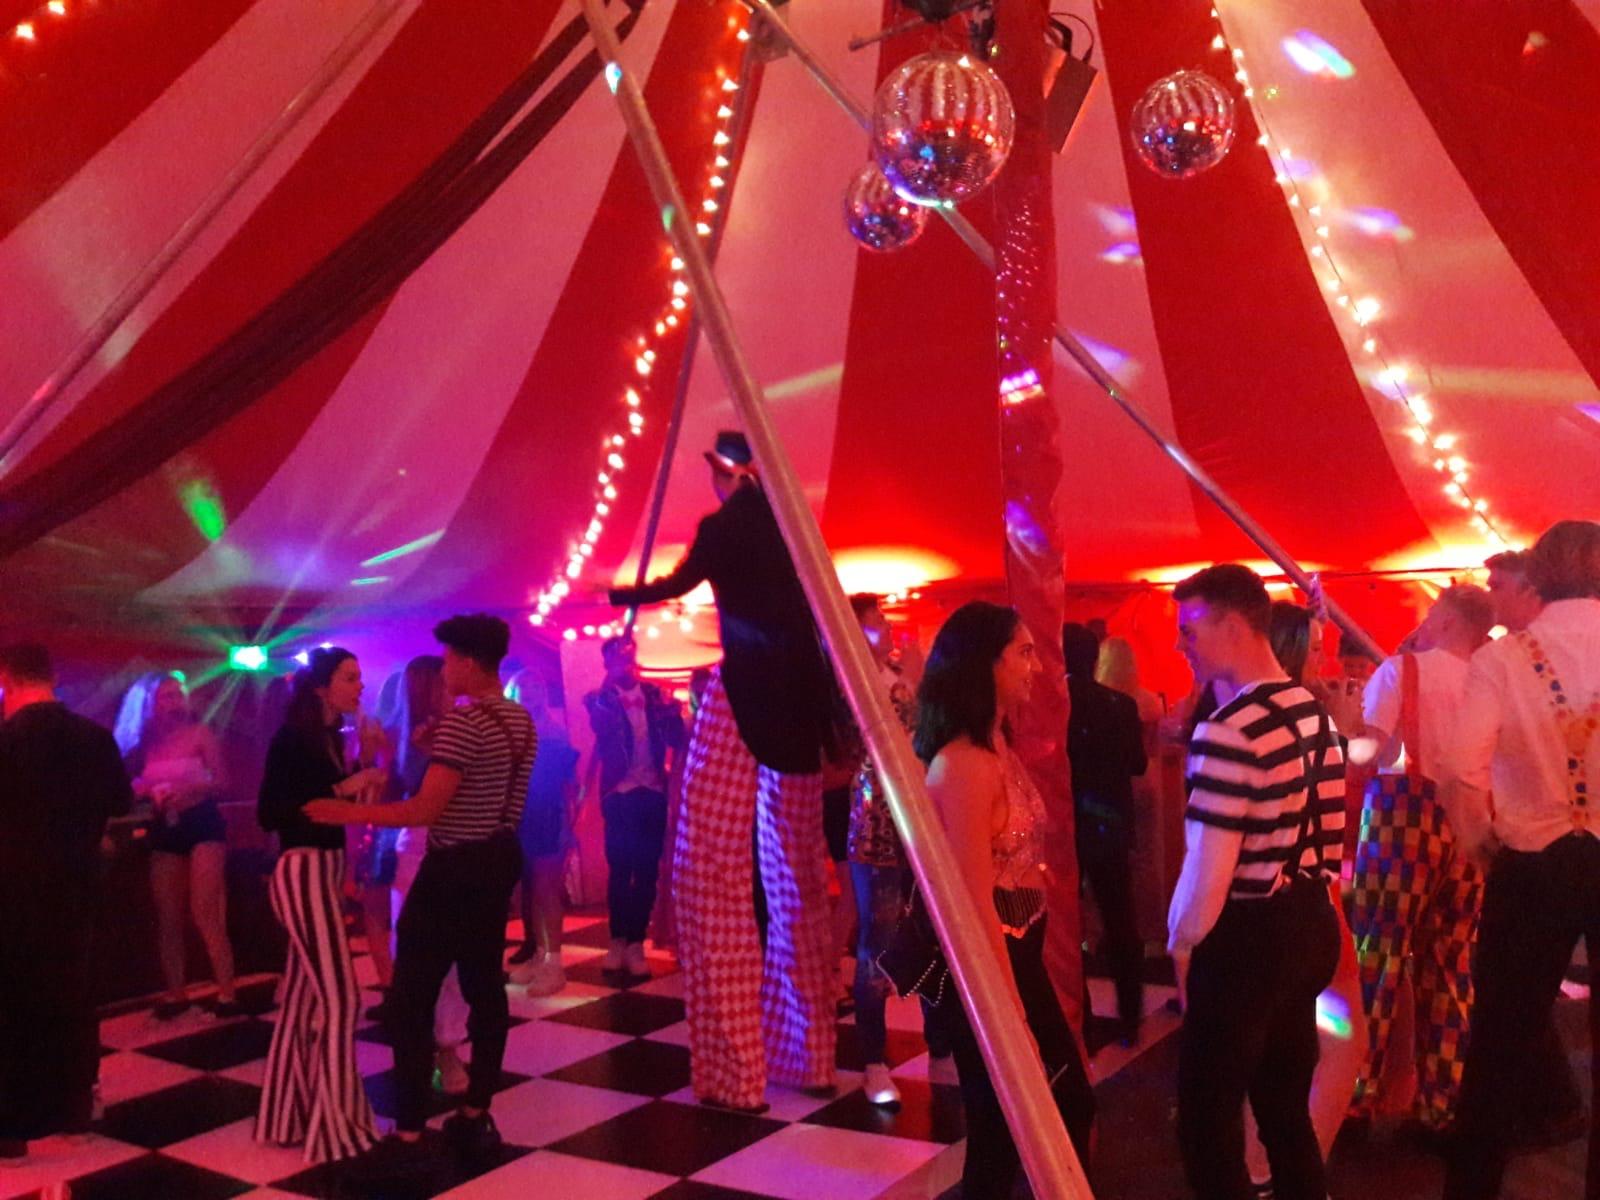 Inside circus party nightclub tent